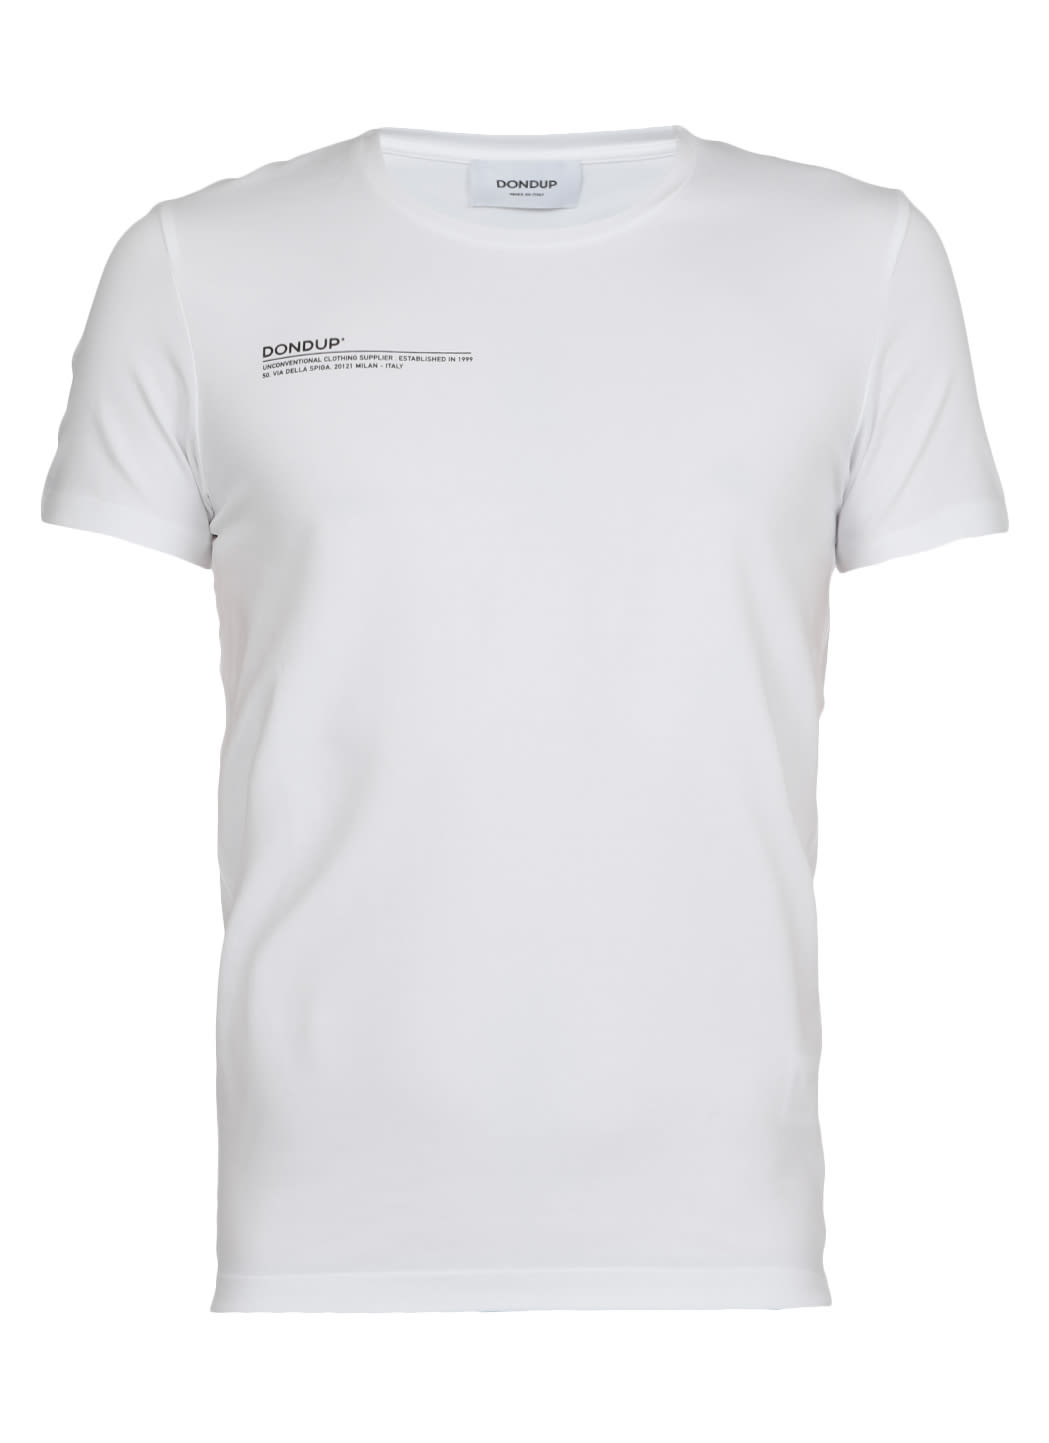 Dondup Cottons LOGO T-SHIRT